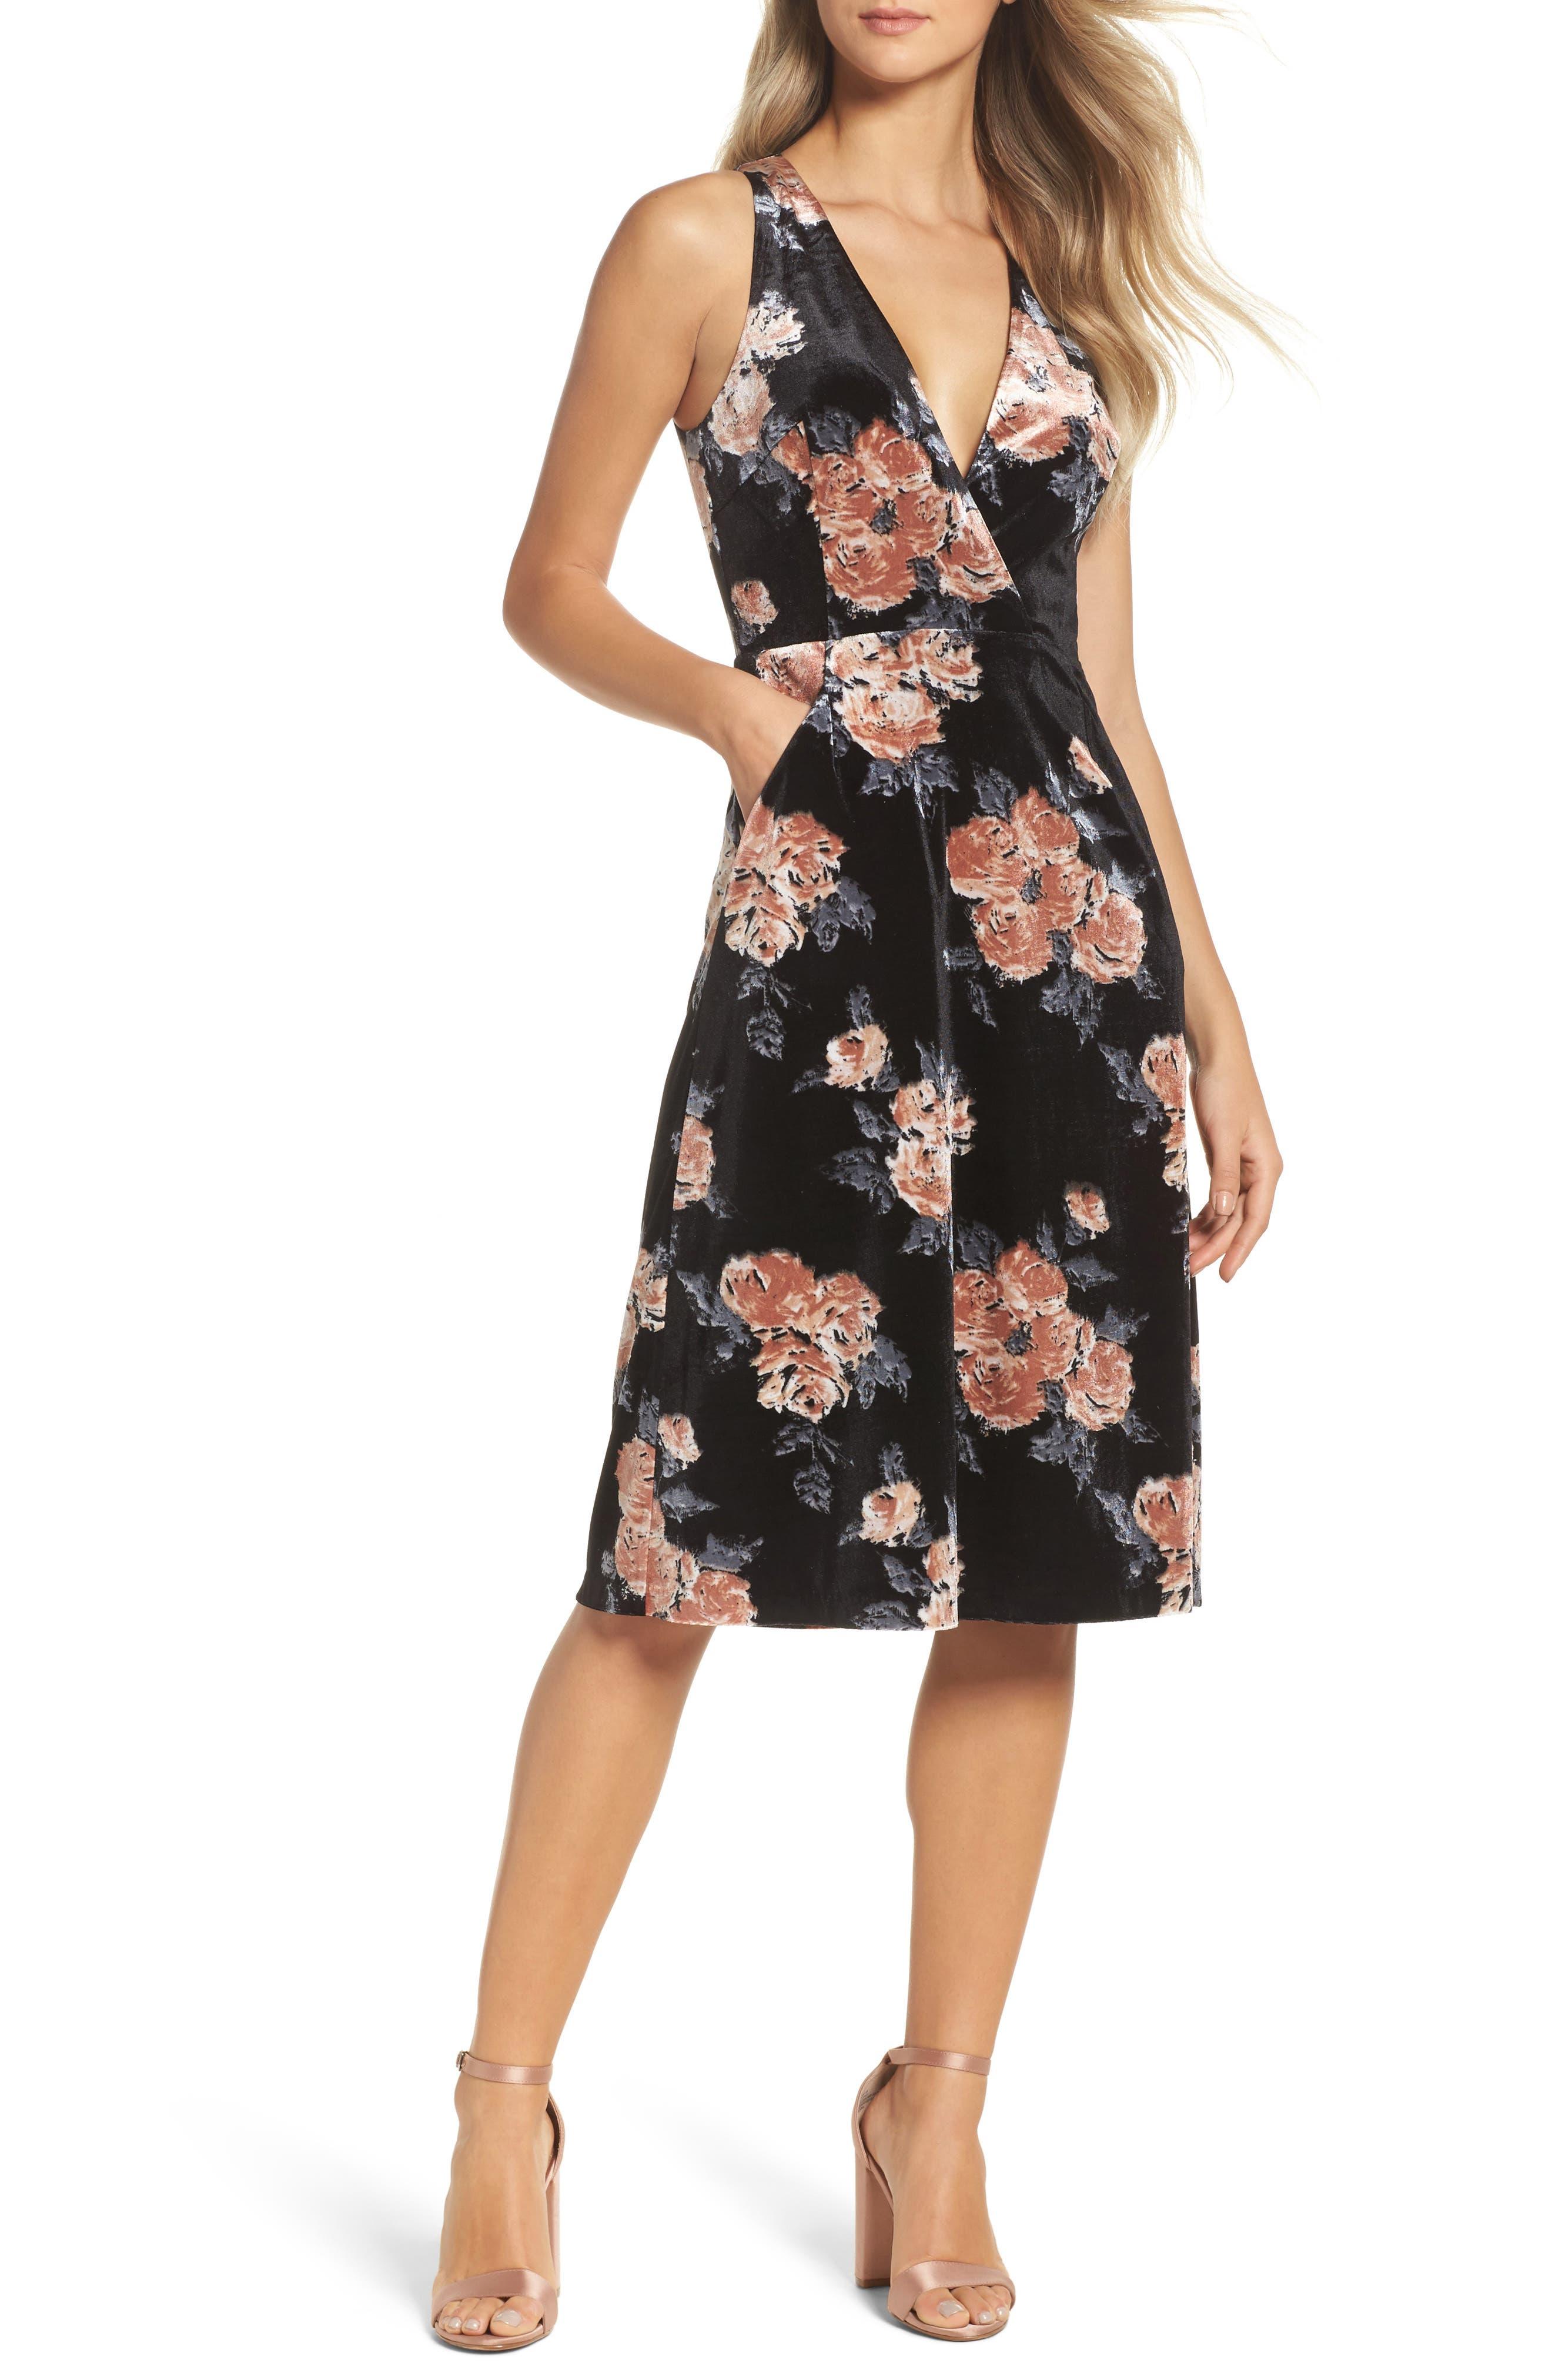 Costes Velvet Fit & Flare Dress,                             Main thumbnail 1, color,                             Black Rosettes